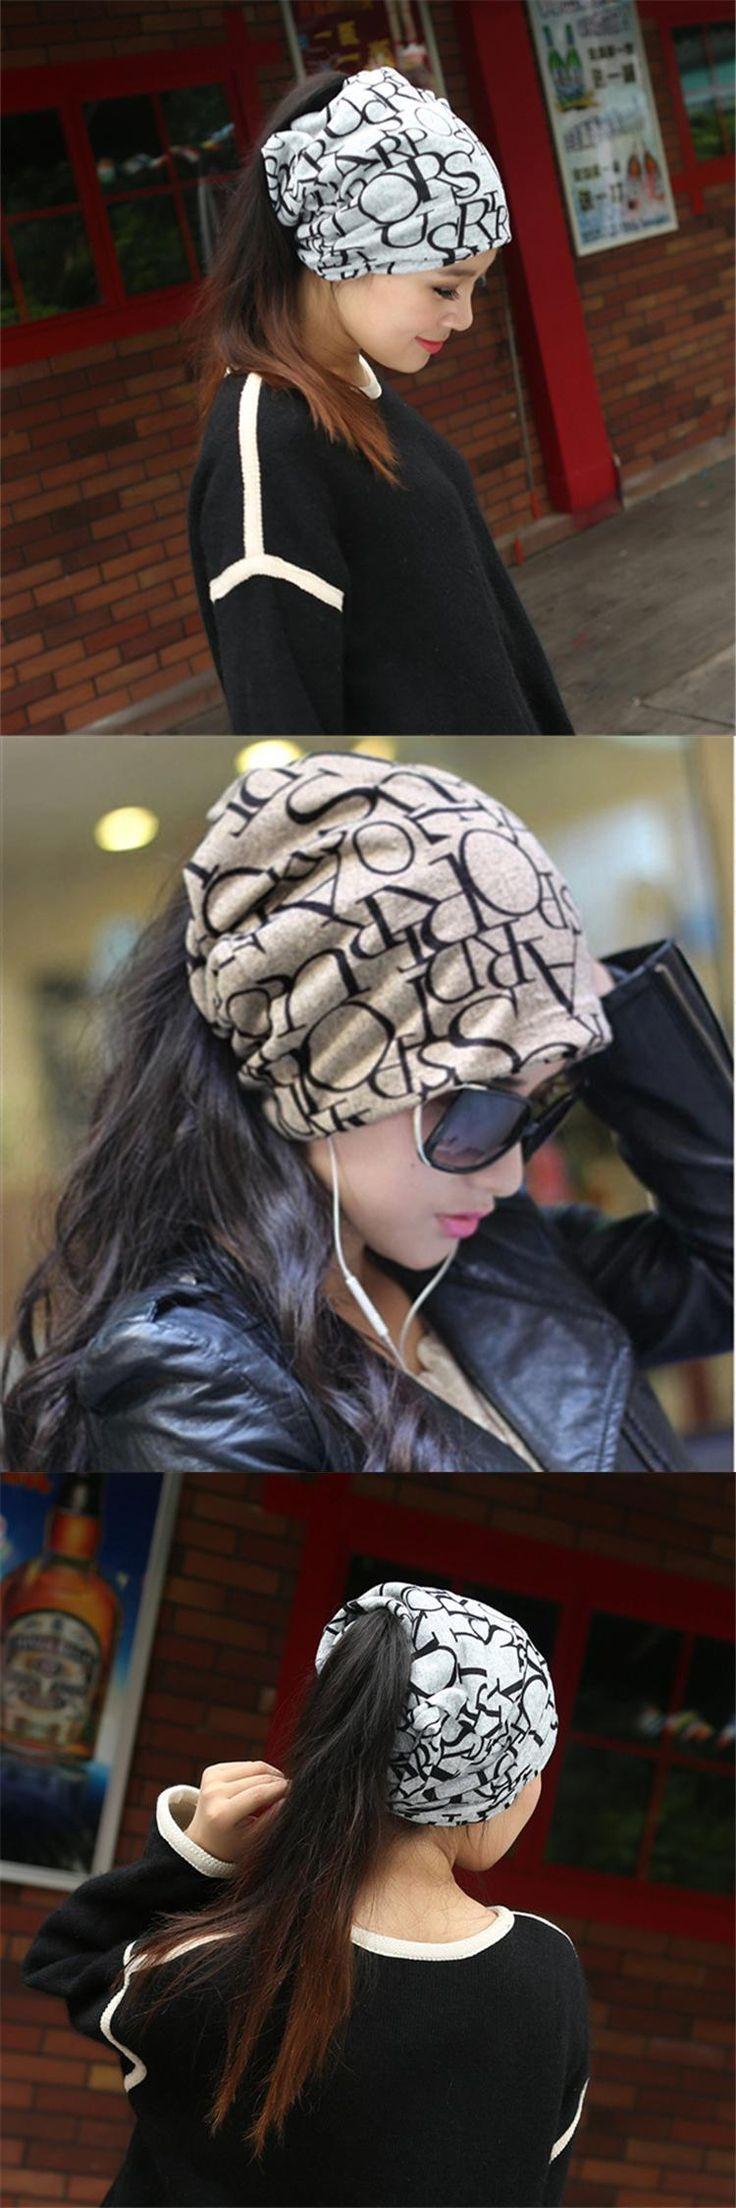 2017 Adult New Winter Hat Deck Imitation Cashmere English Alphabet Cap Multifunctional Baotou Maternity Anti Wind Hip Hop Sale